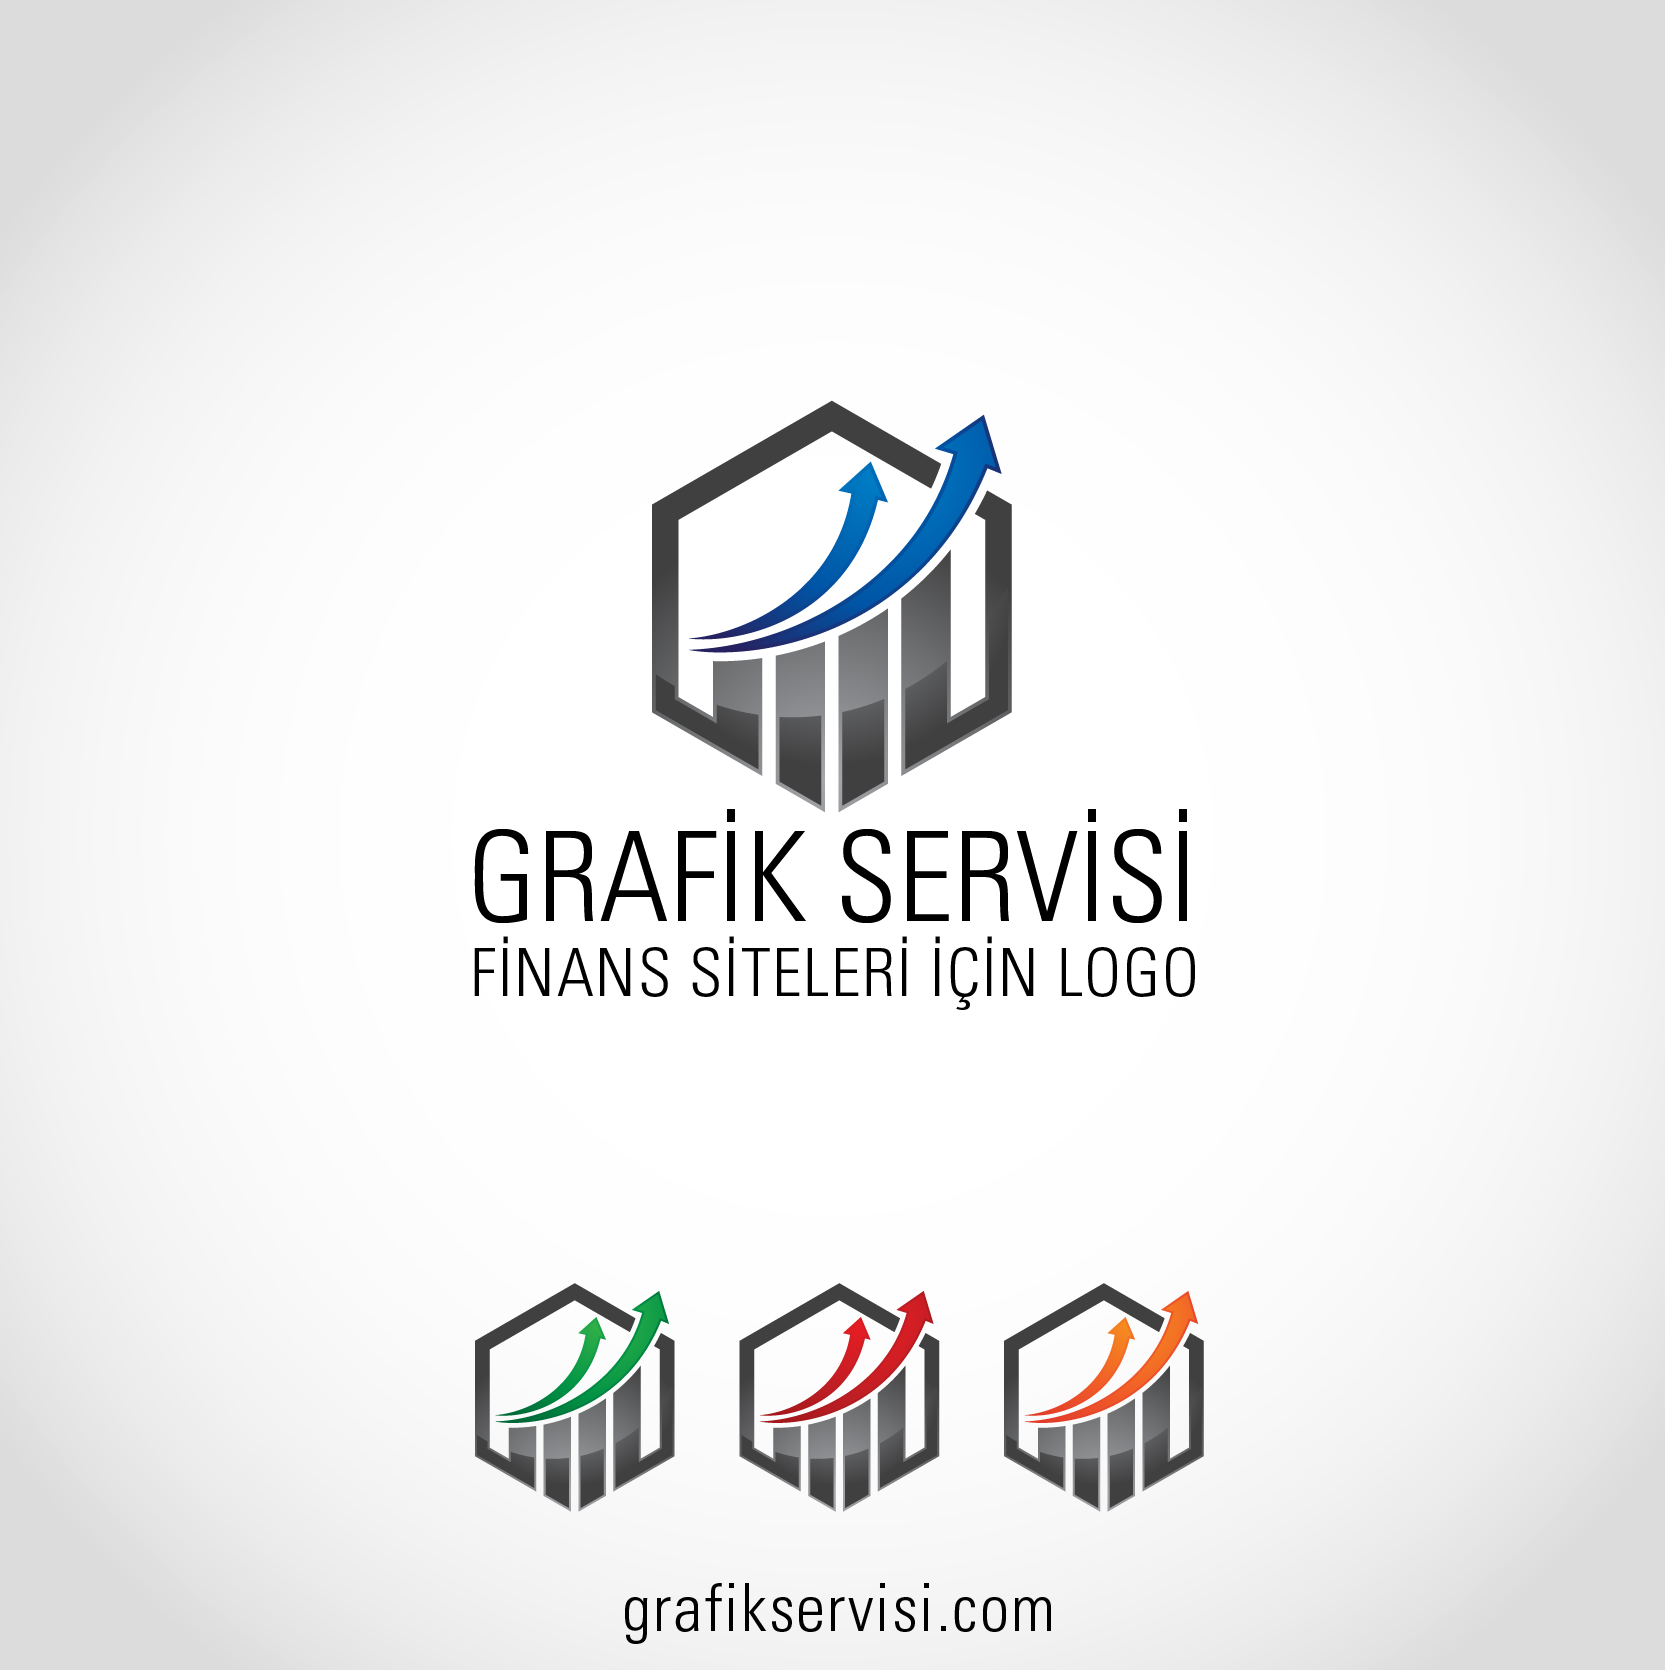 finans-siteleri-grafikservisi.png